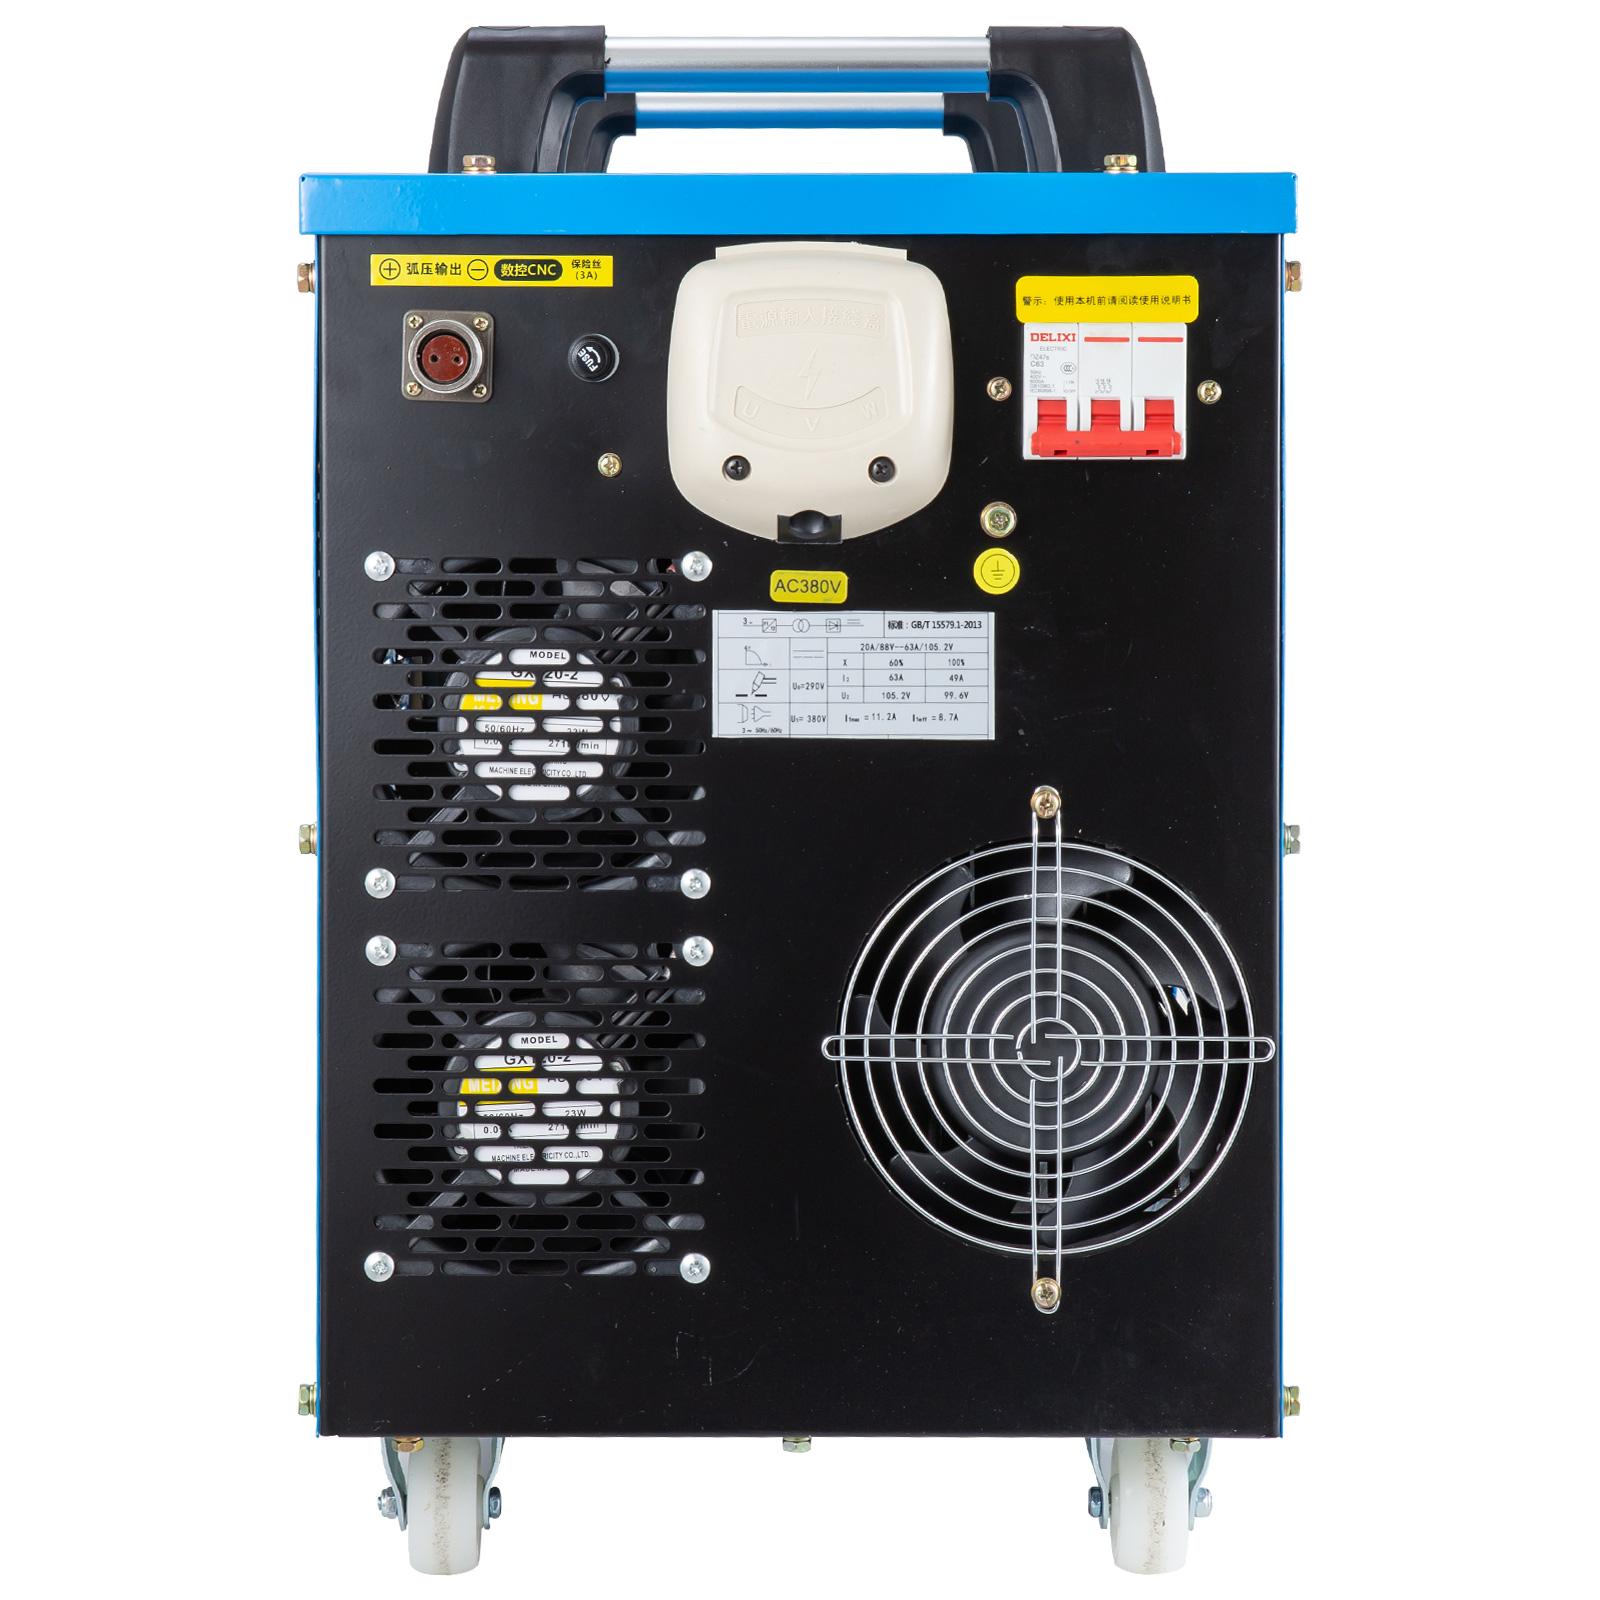 40-85A-Plasma-Cutter-Built-In-Air-Compressor-Inverter-Cutting-Machine-Cut-35mm thumbnail 48